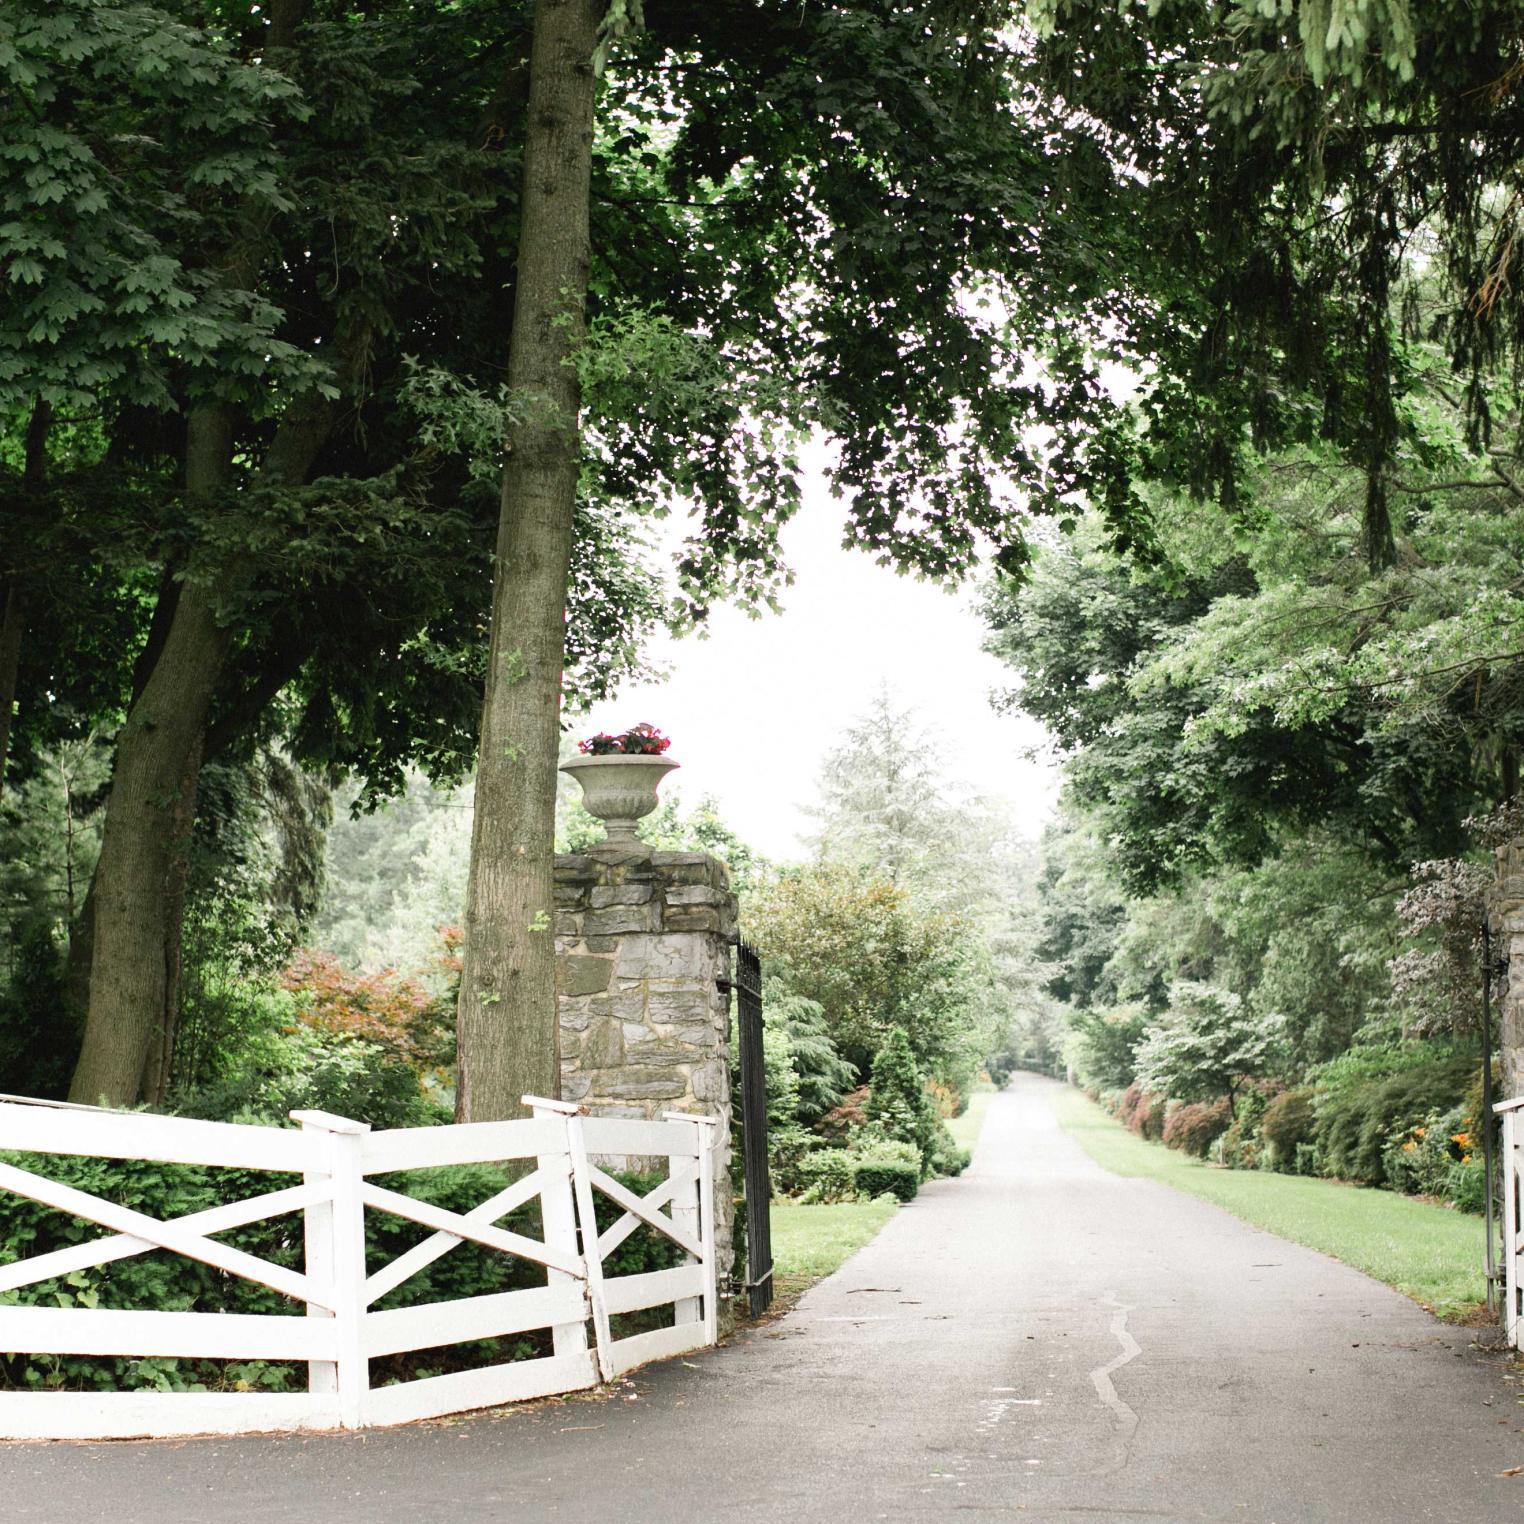 Entrance to Linwood